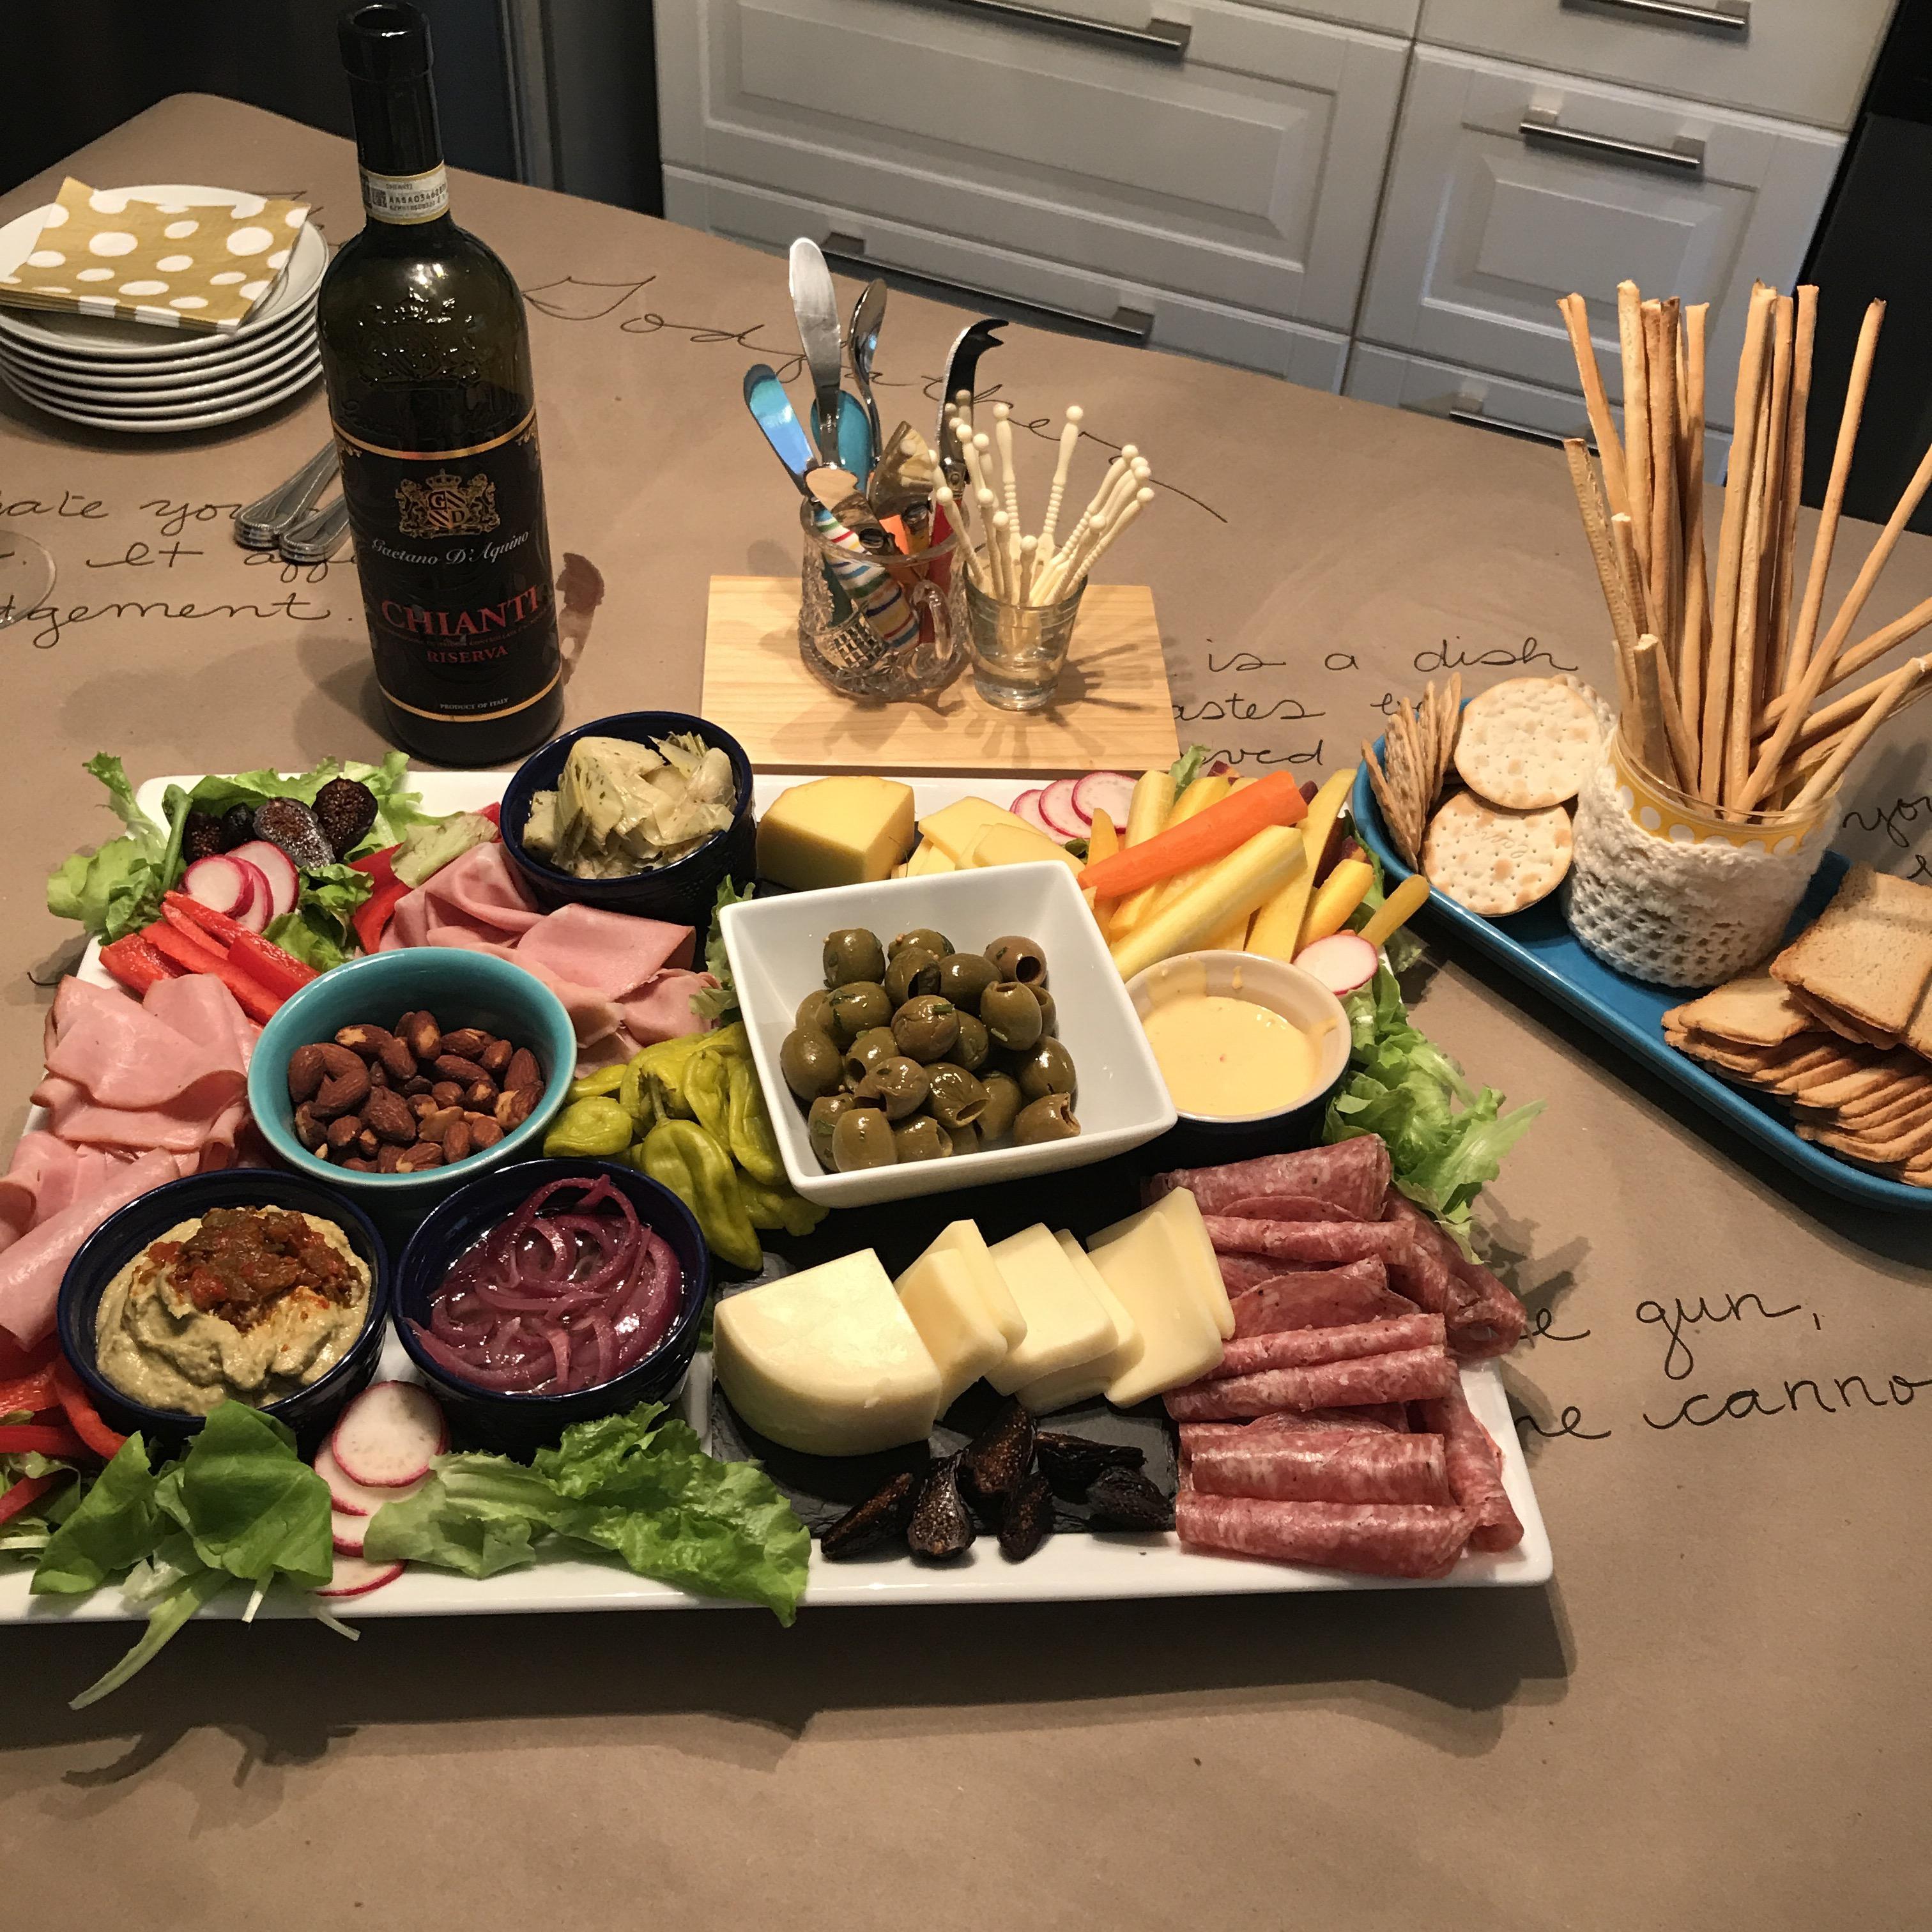 antipasto platter, antipasto, italian meats, italian cheese, the godfather party